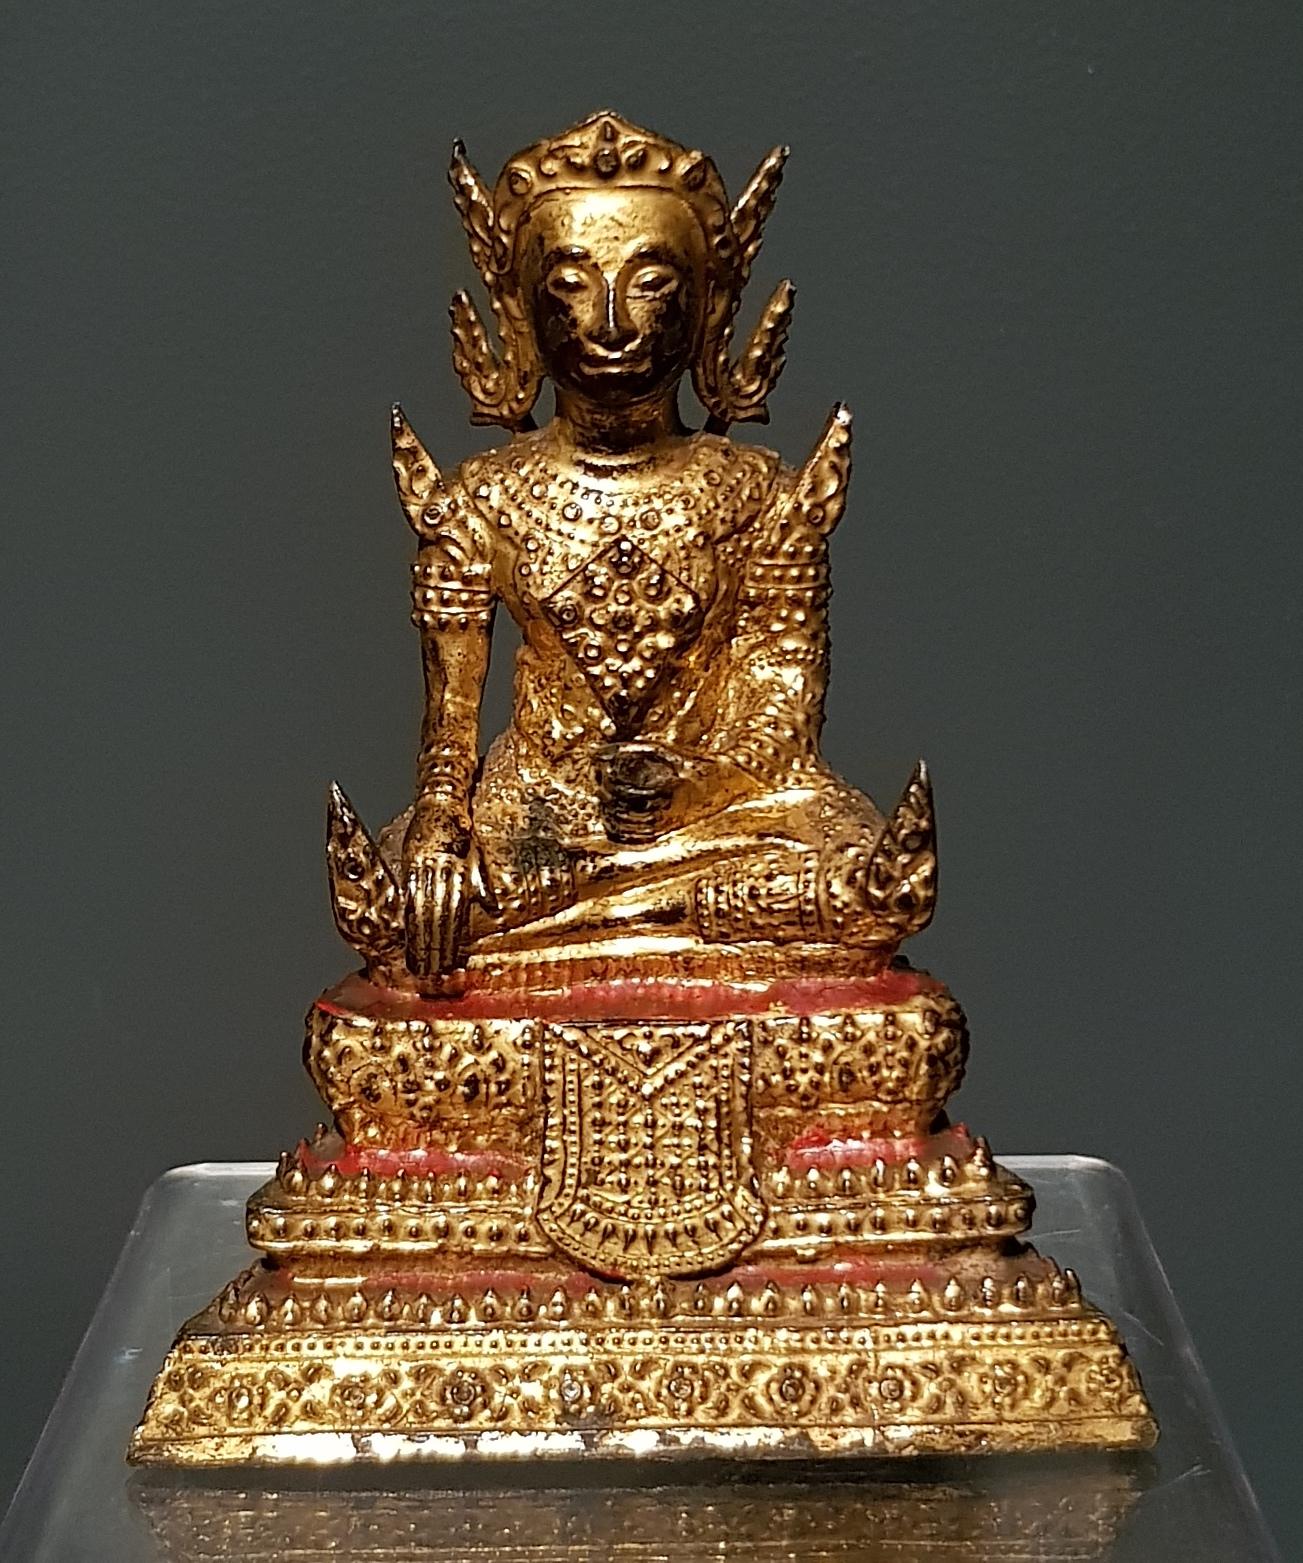 Thaïlande - Bouddha Maitreya - Rattanakosin - Fin 19ème. Image